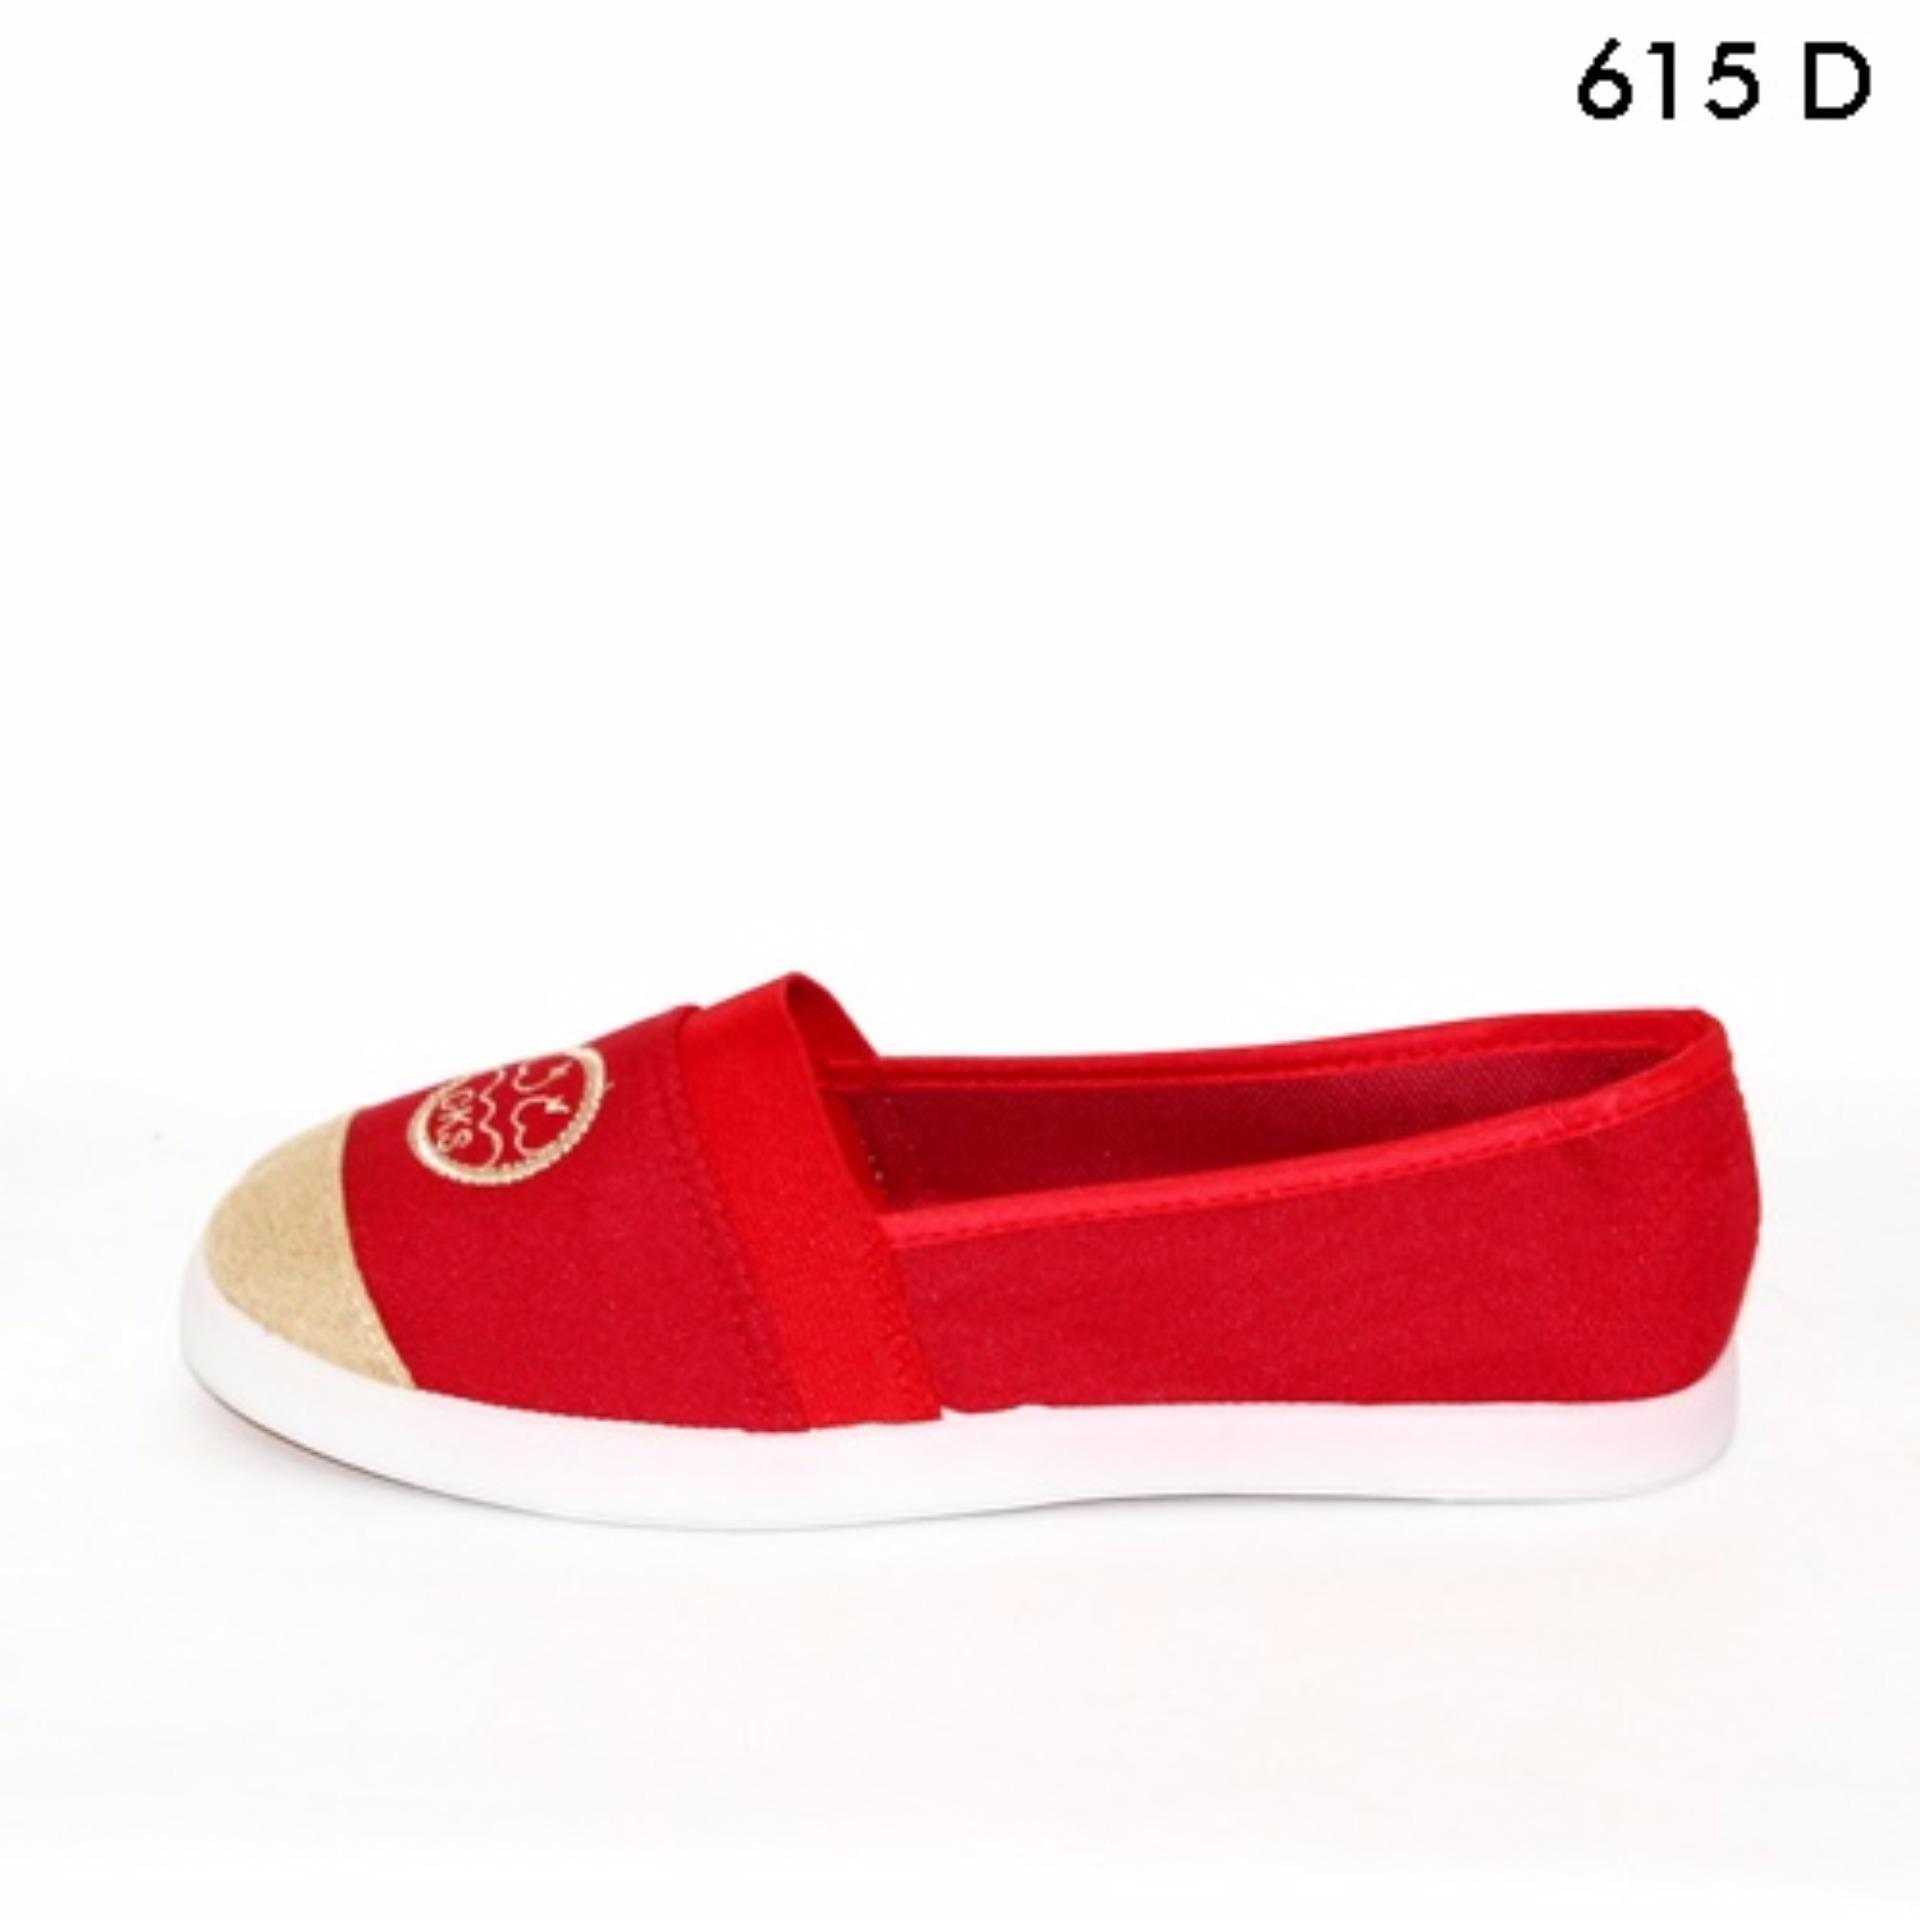 Marlee sepatu slip on wanita impor 615 ...